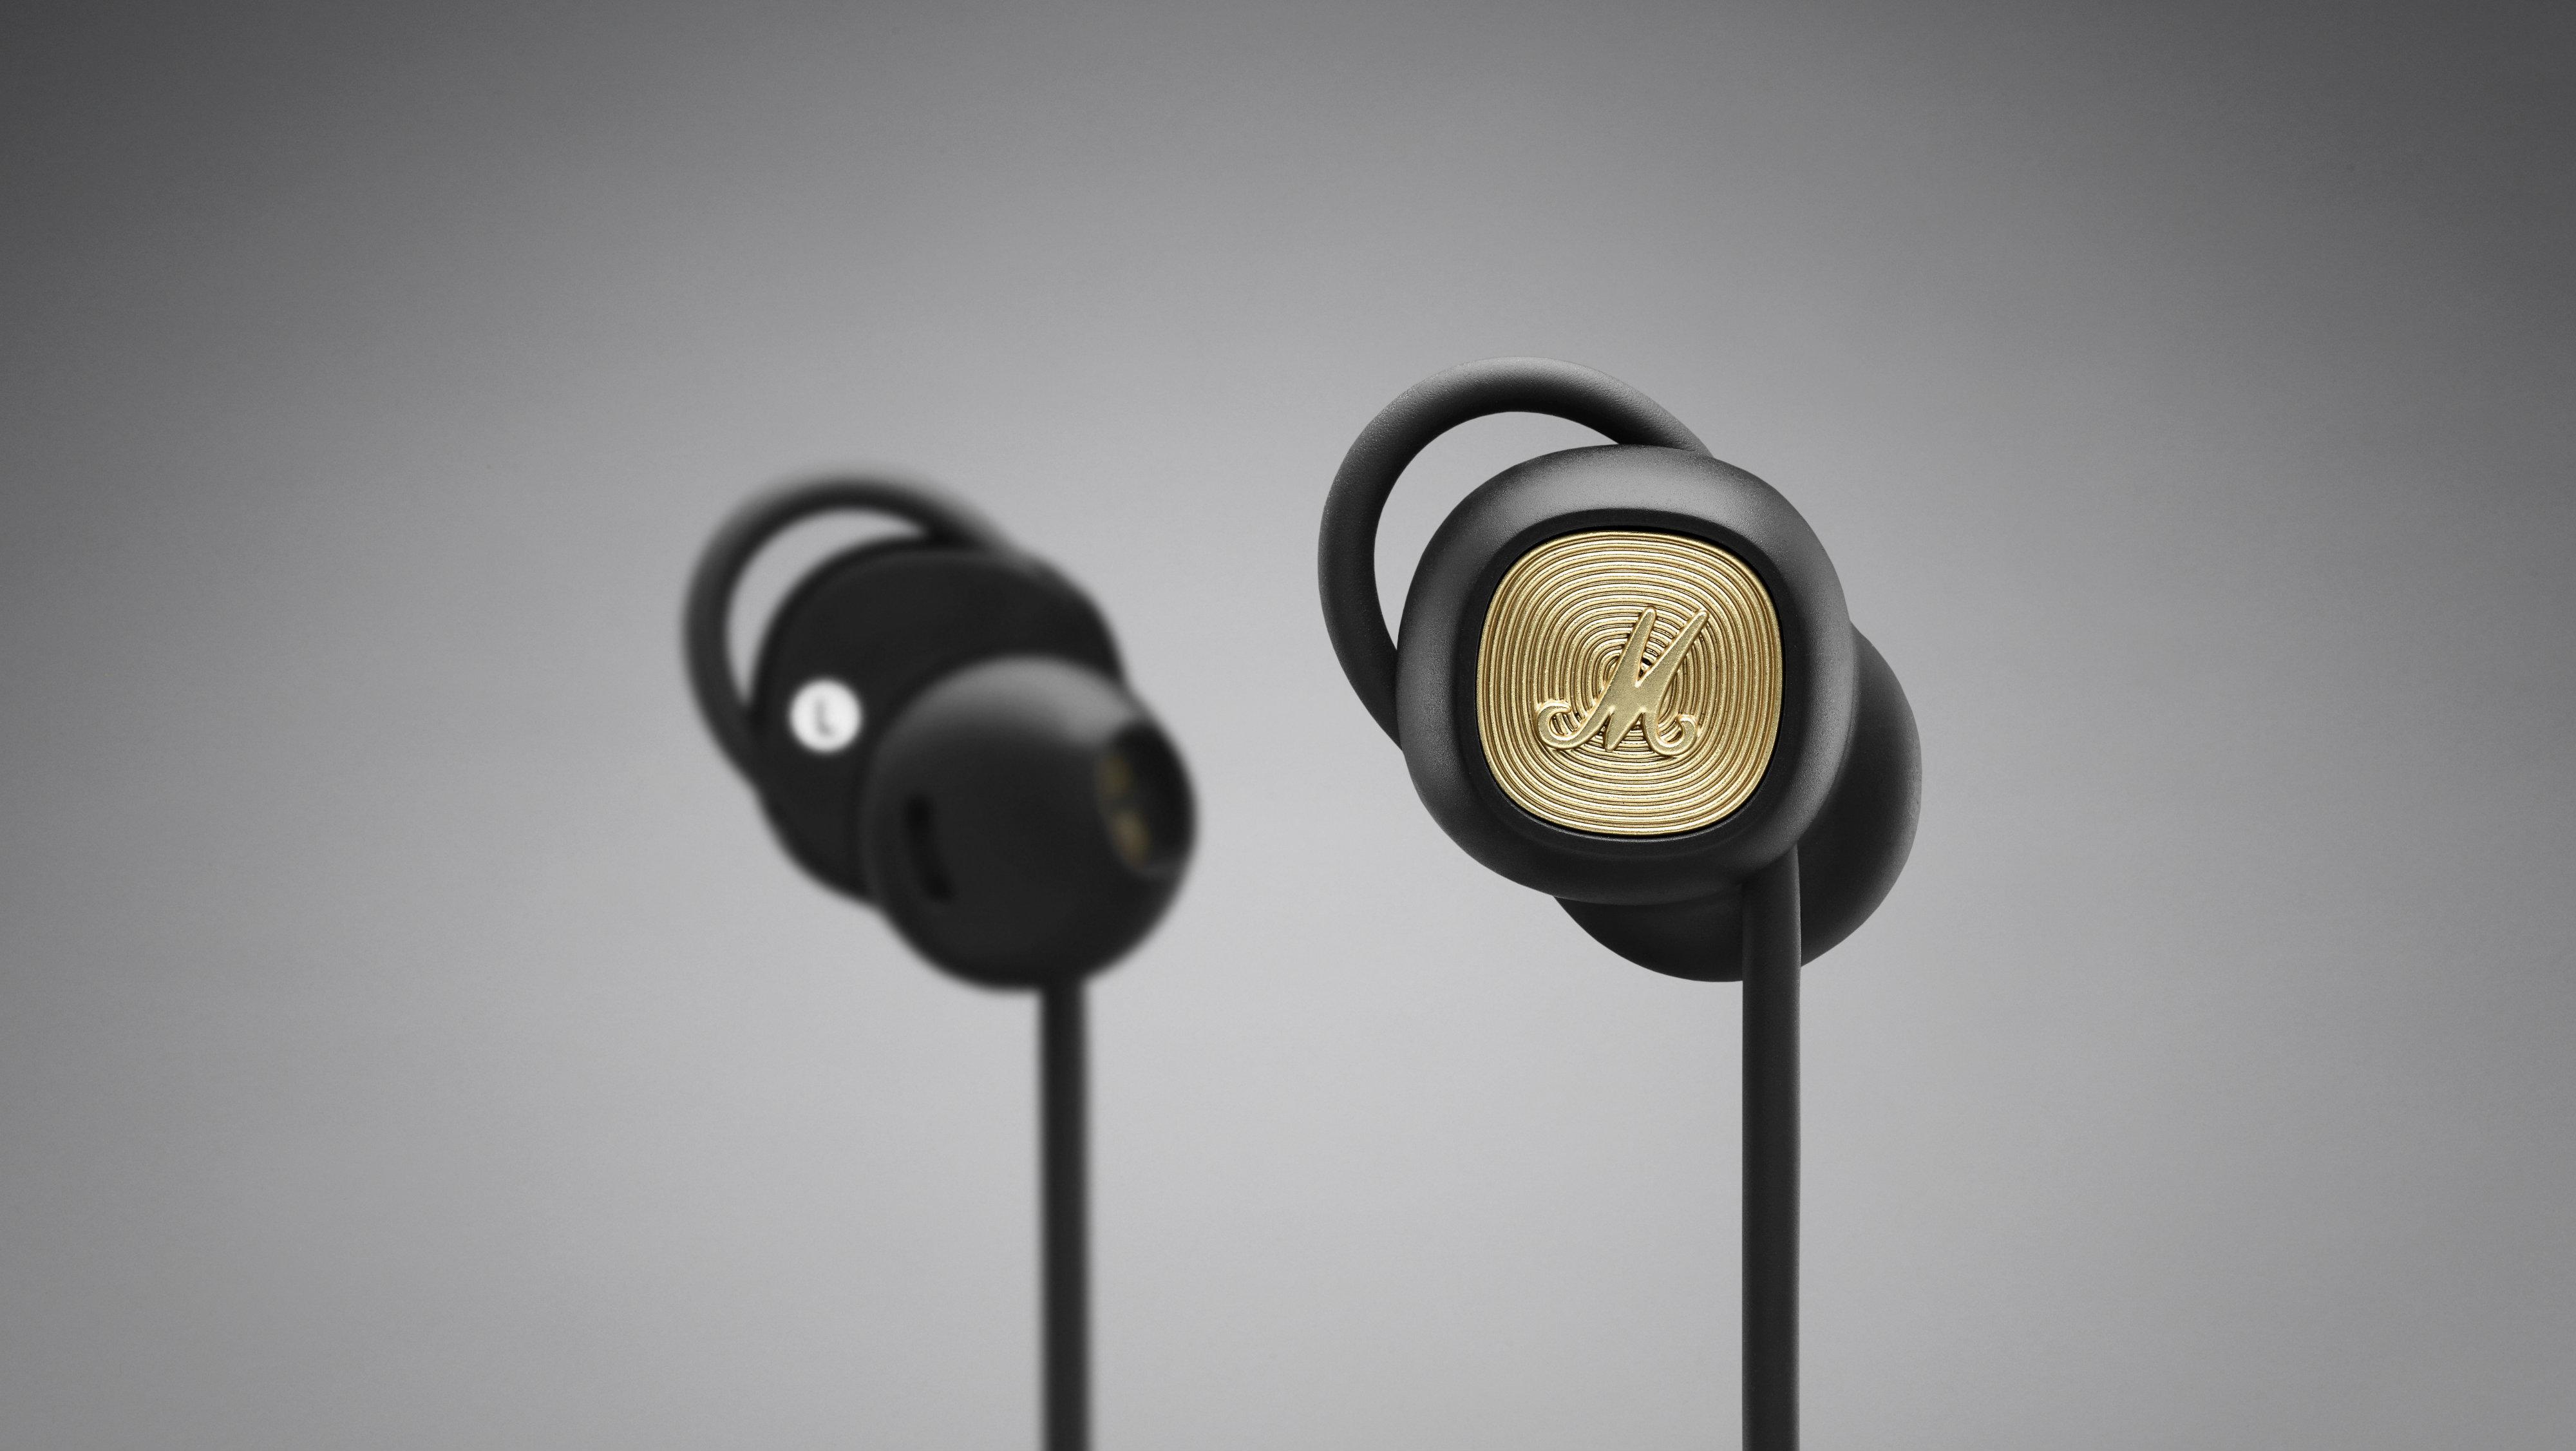 Marshall brings major update to the Minor Bluetooth in-ear headphones